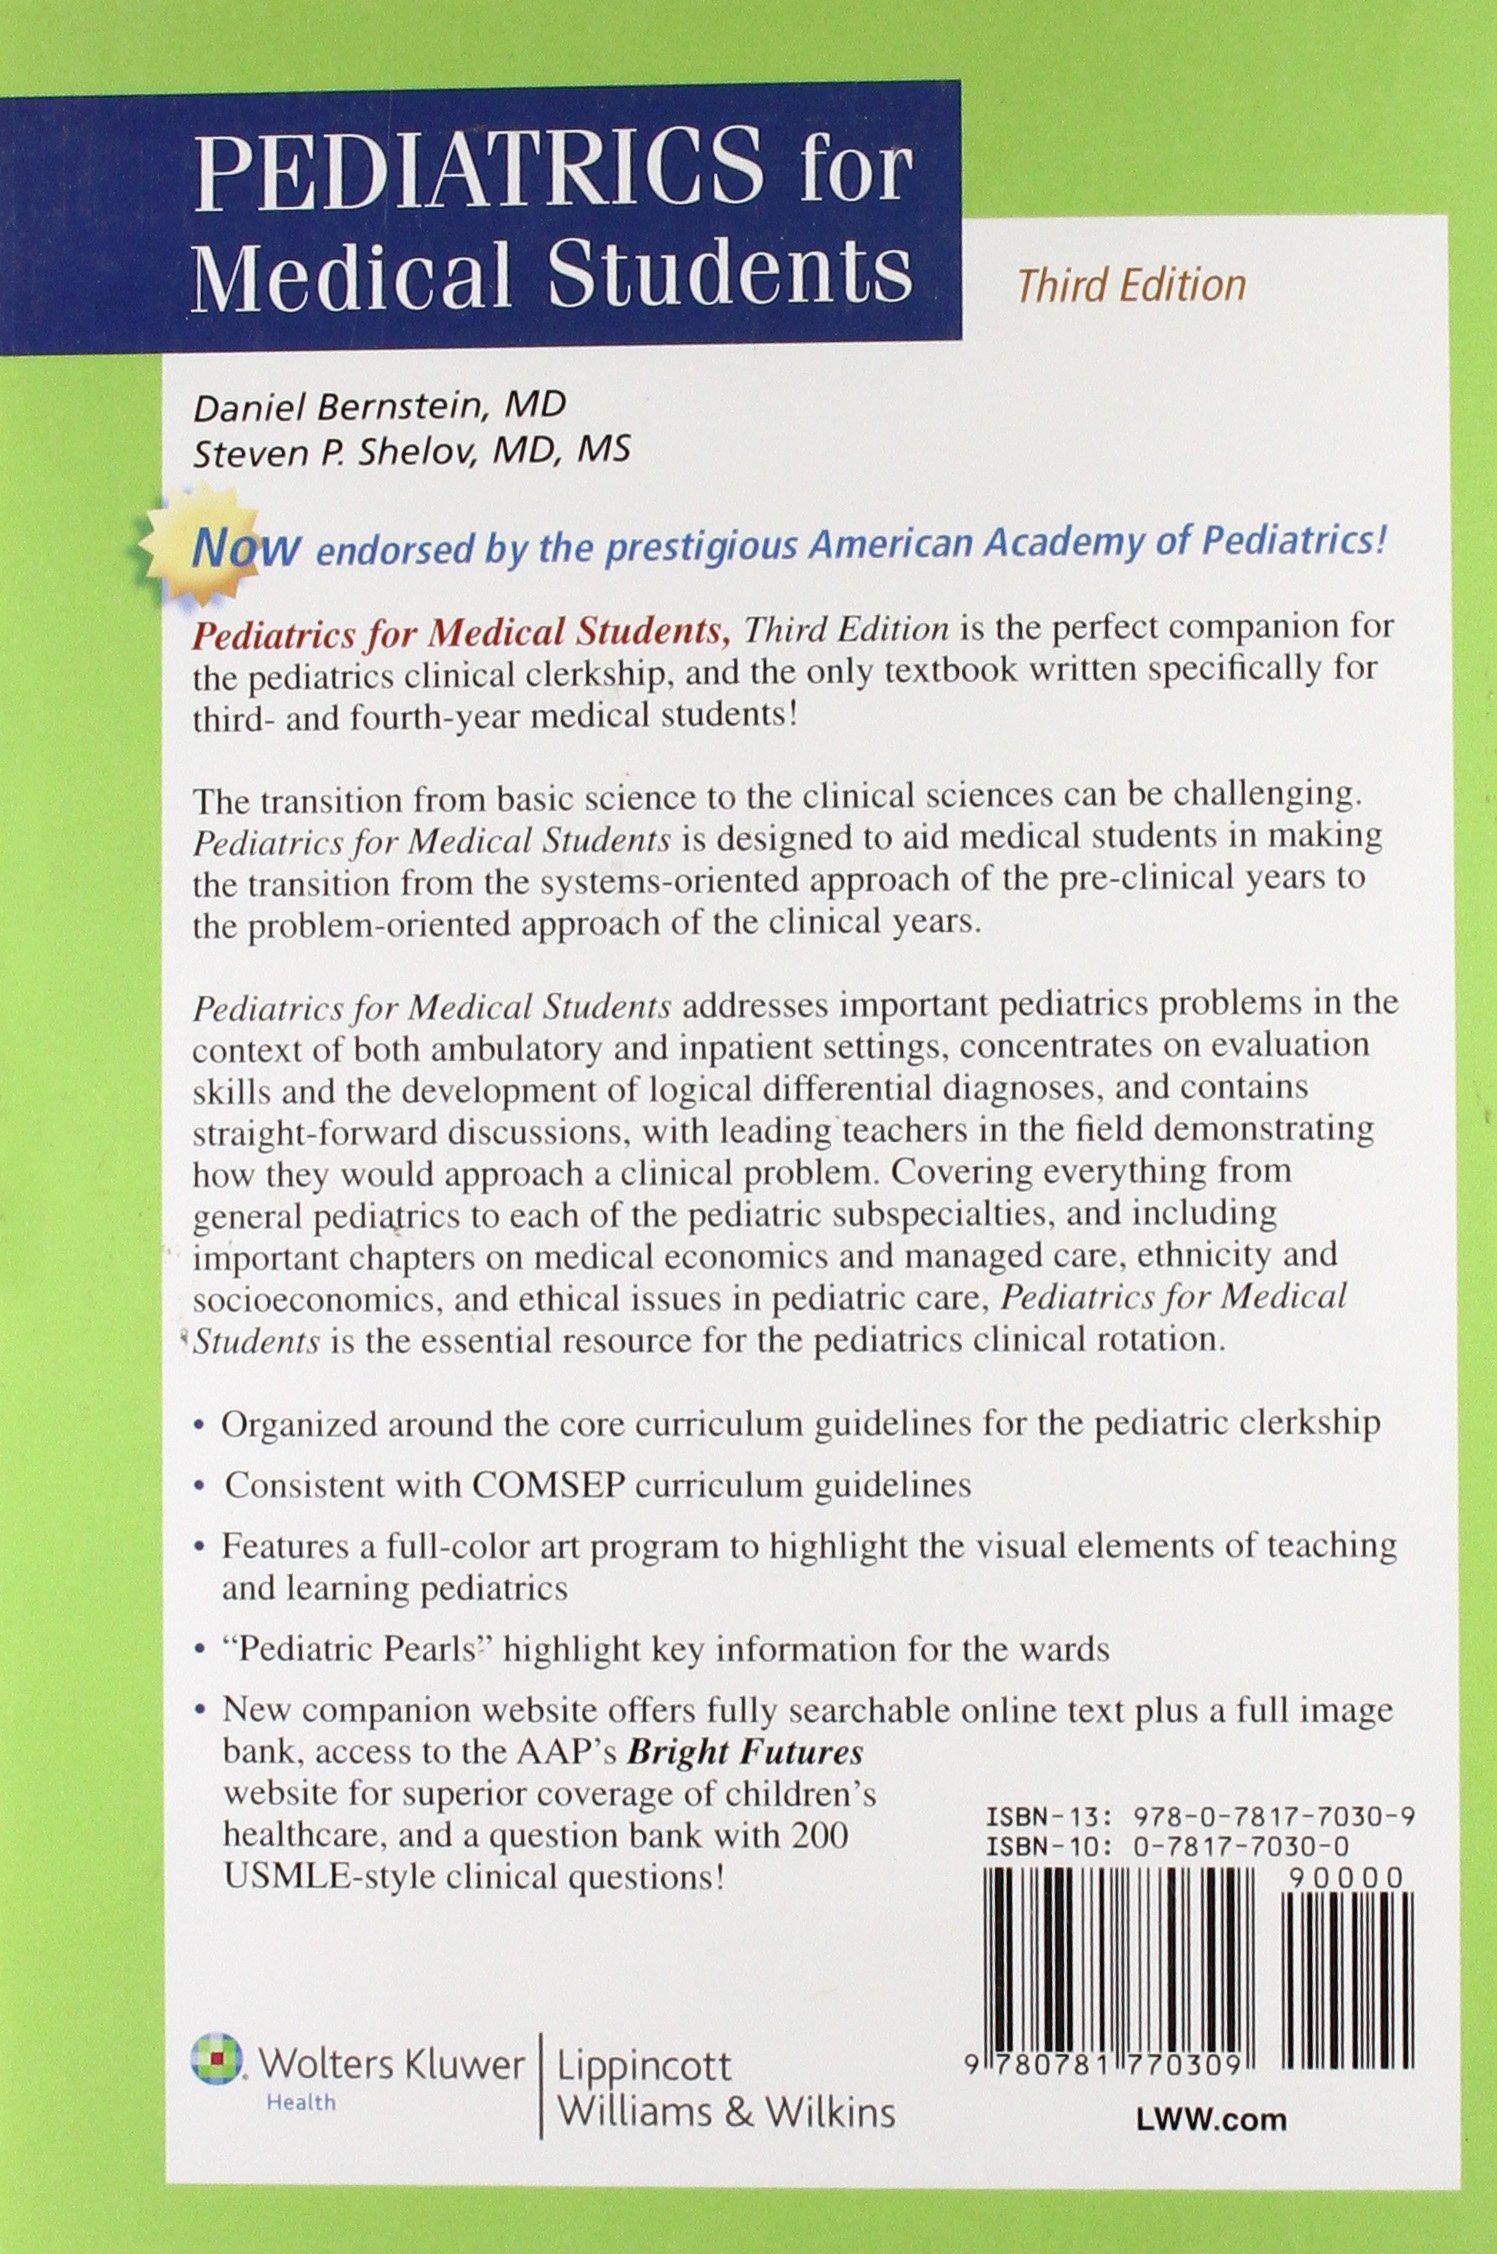 Pediatrics for Medical Students